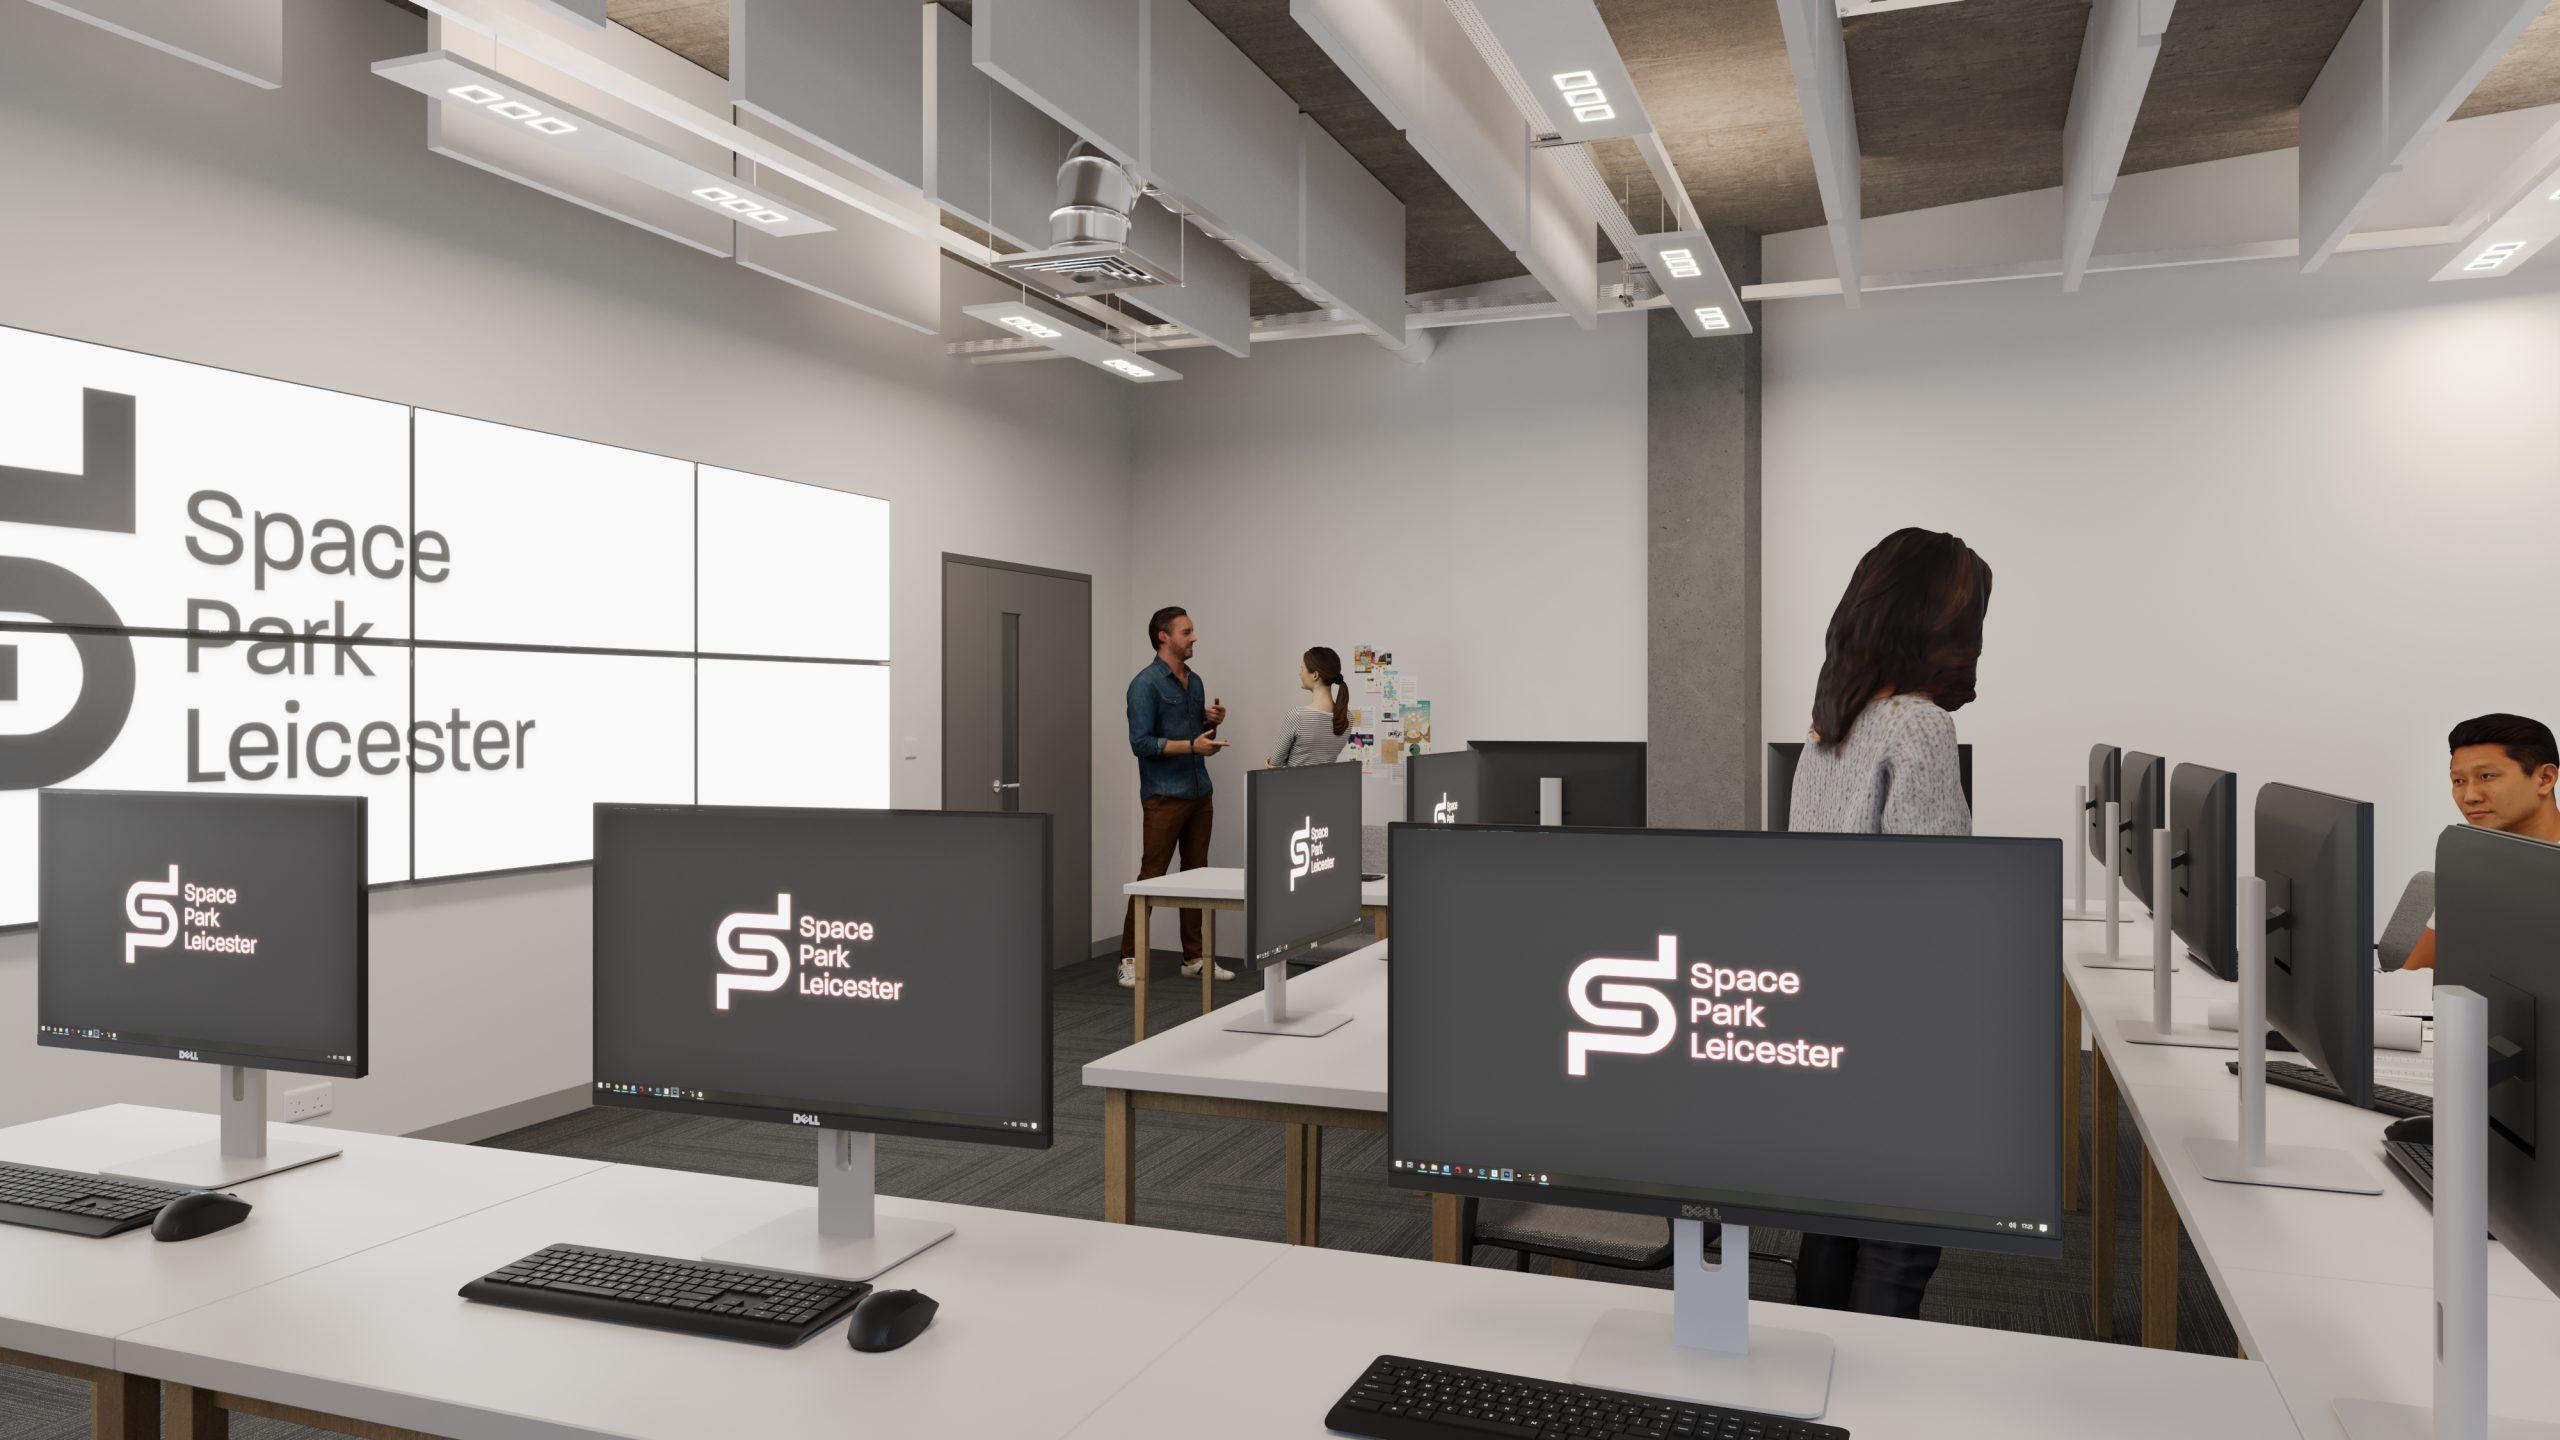 Space Park Leicester concurrent design facility